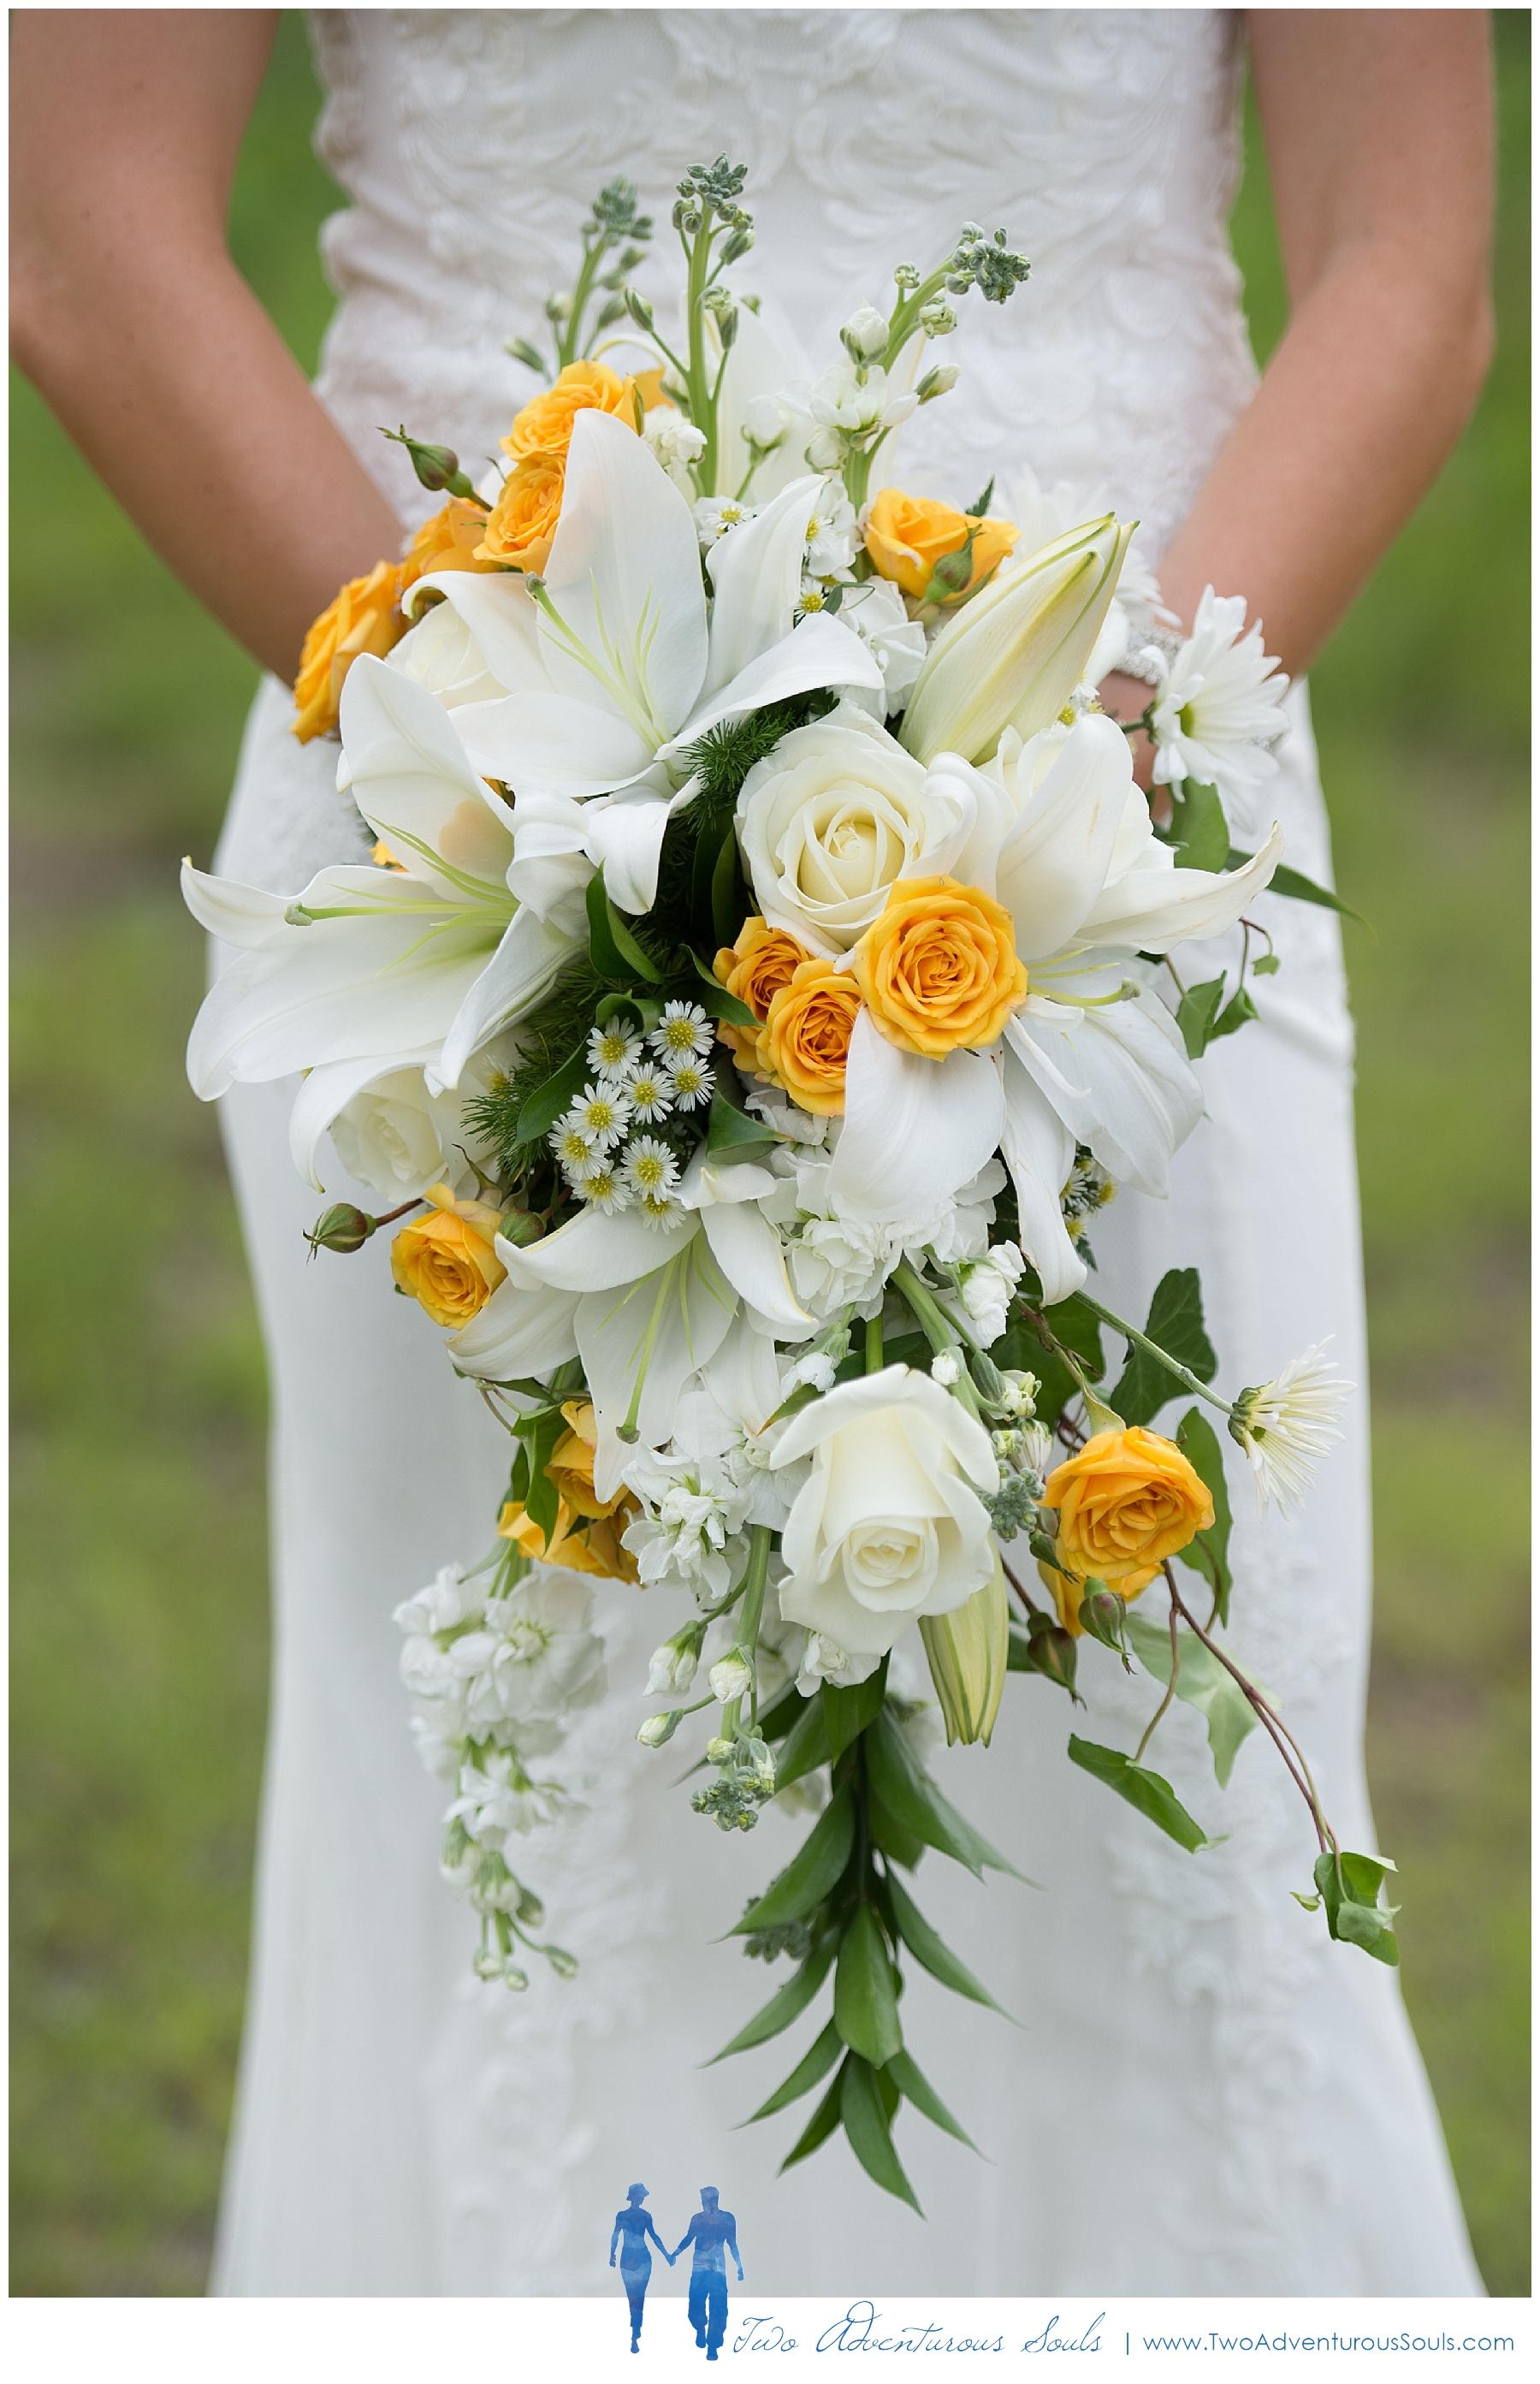 Sunday River Wedding, Maine Wedding Photographers - Stunning Wedding Bouquet